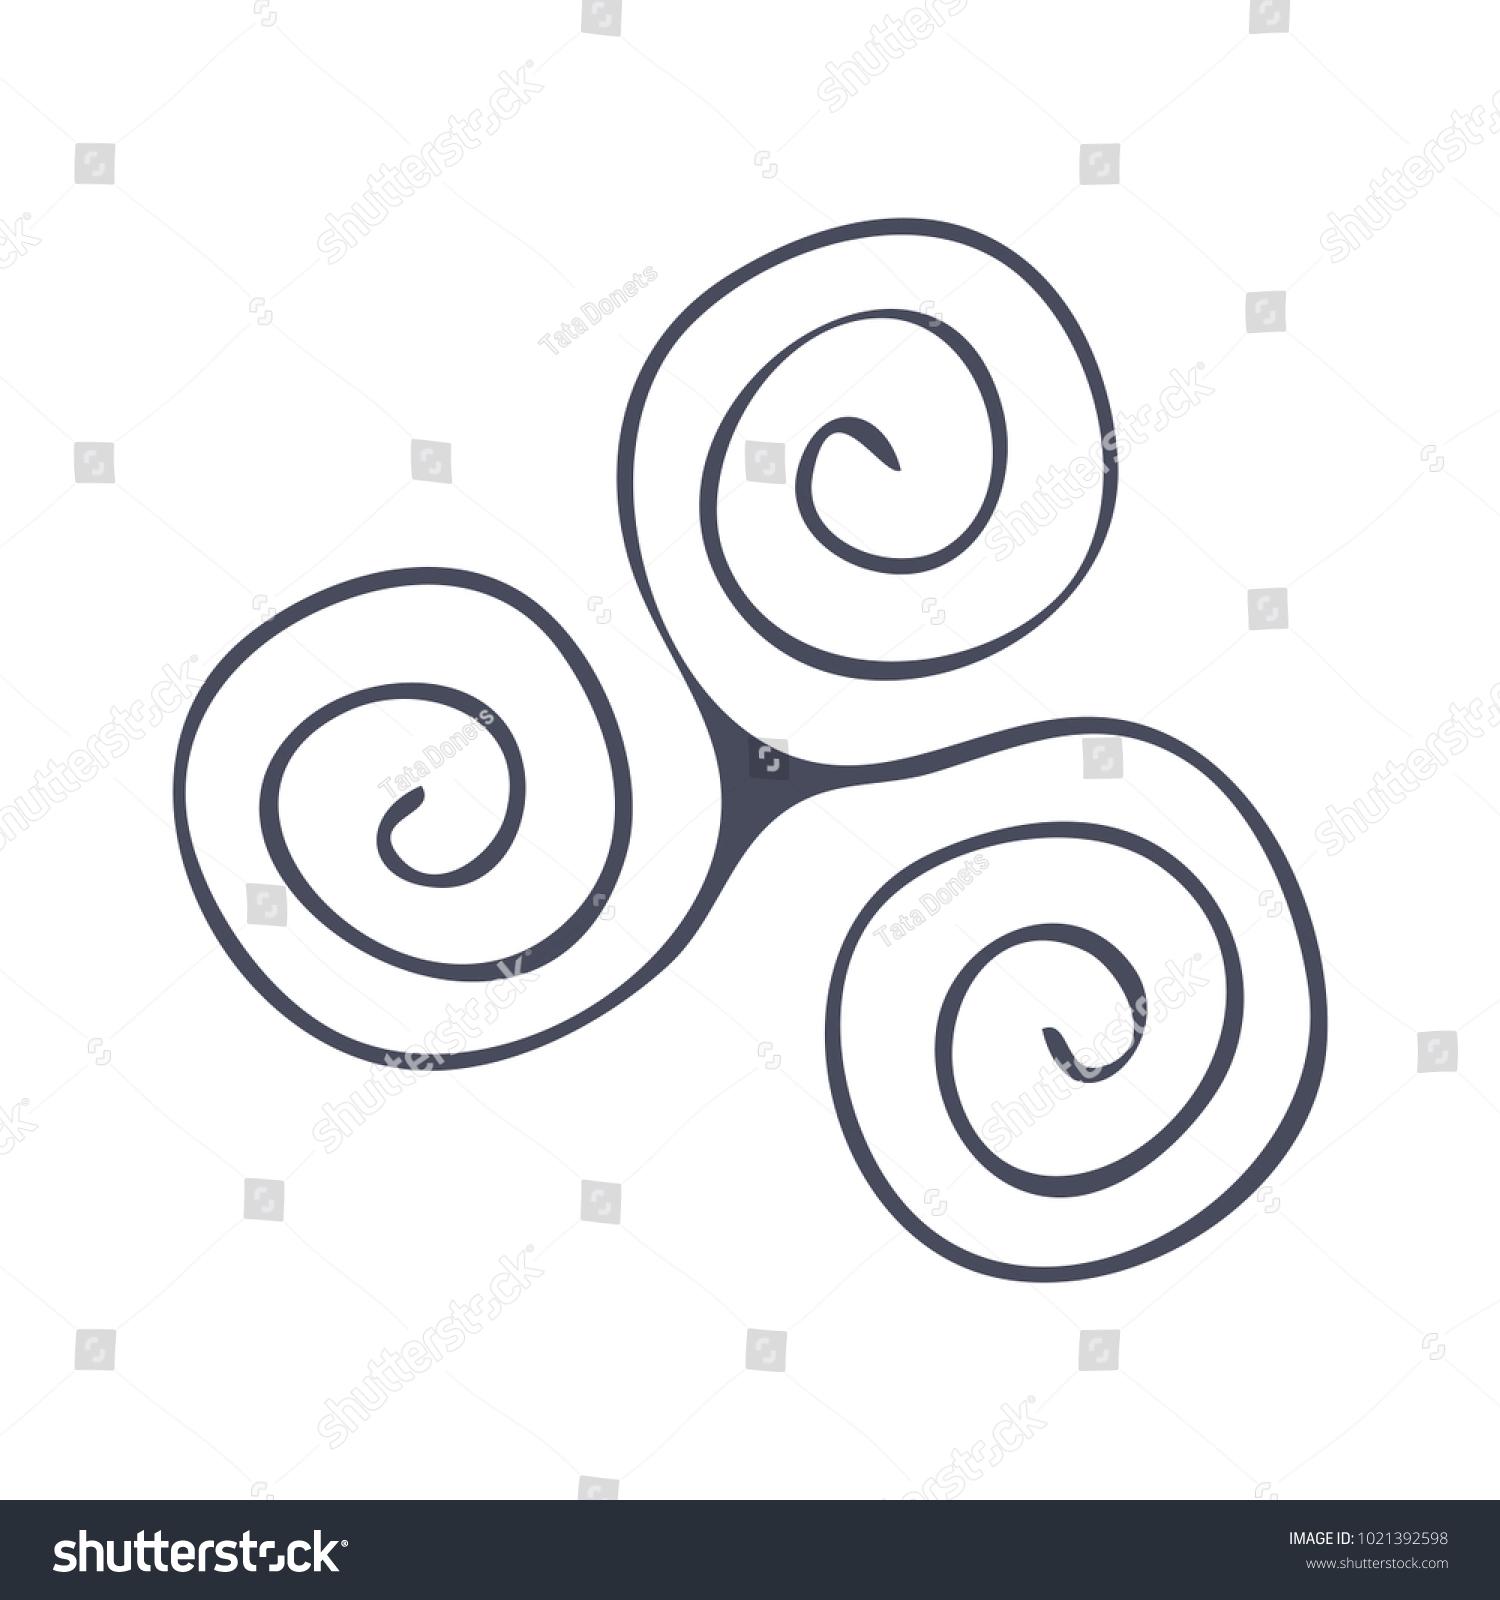 Triskele celtic symbol images symbol and sign ideas vector symbol triad triskelion triskele celtic stock vector vector symbol the triad triskelion triskele or celtic biocorpaavc